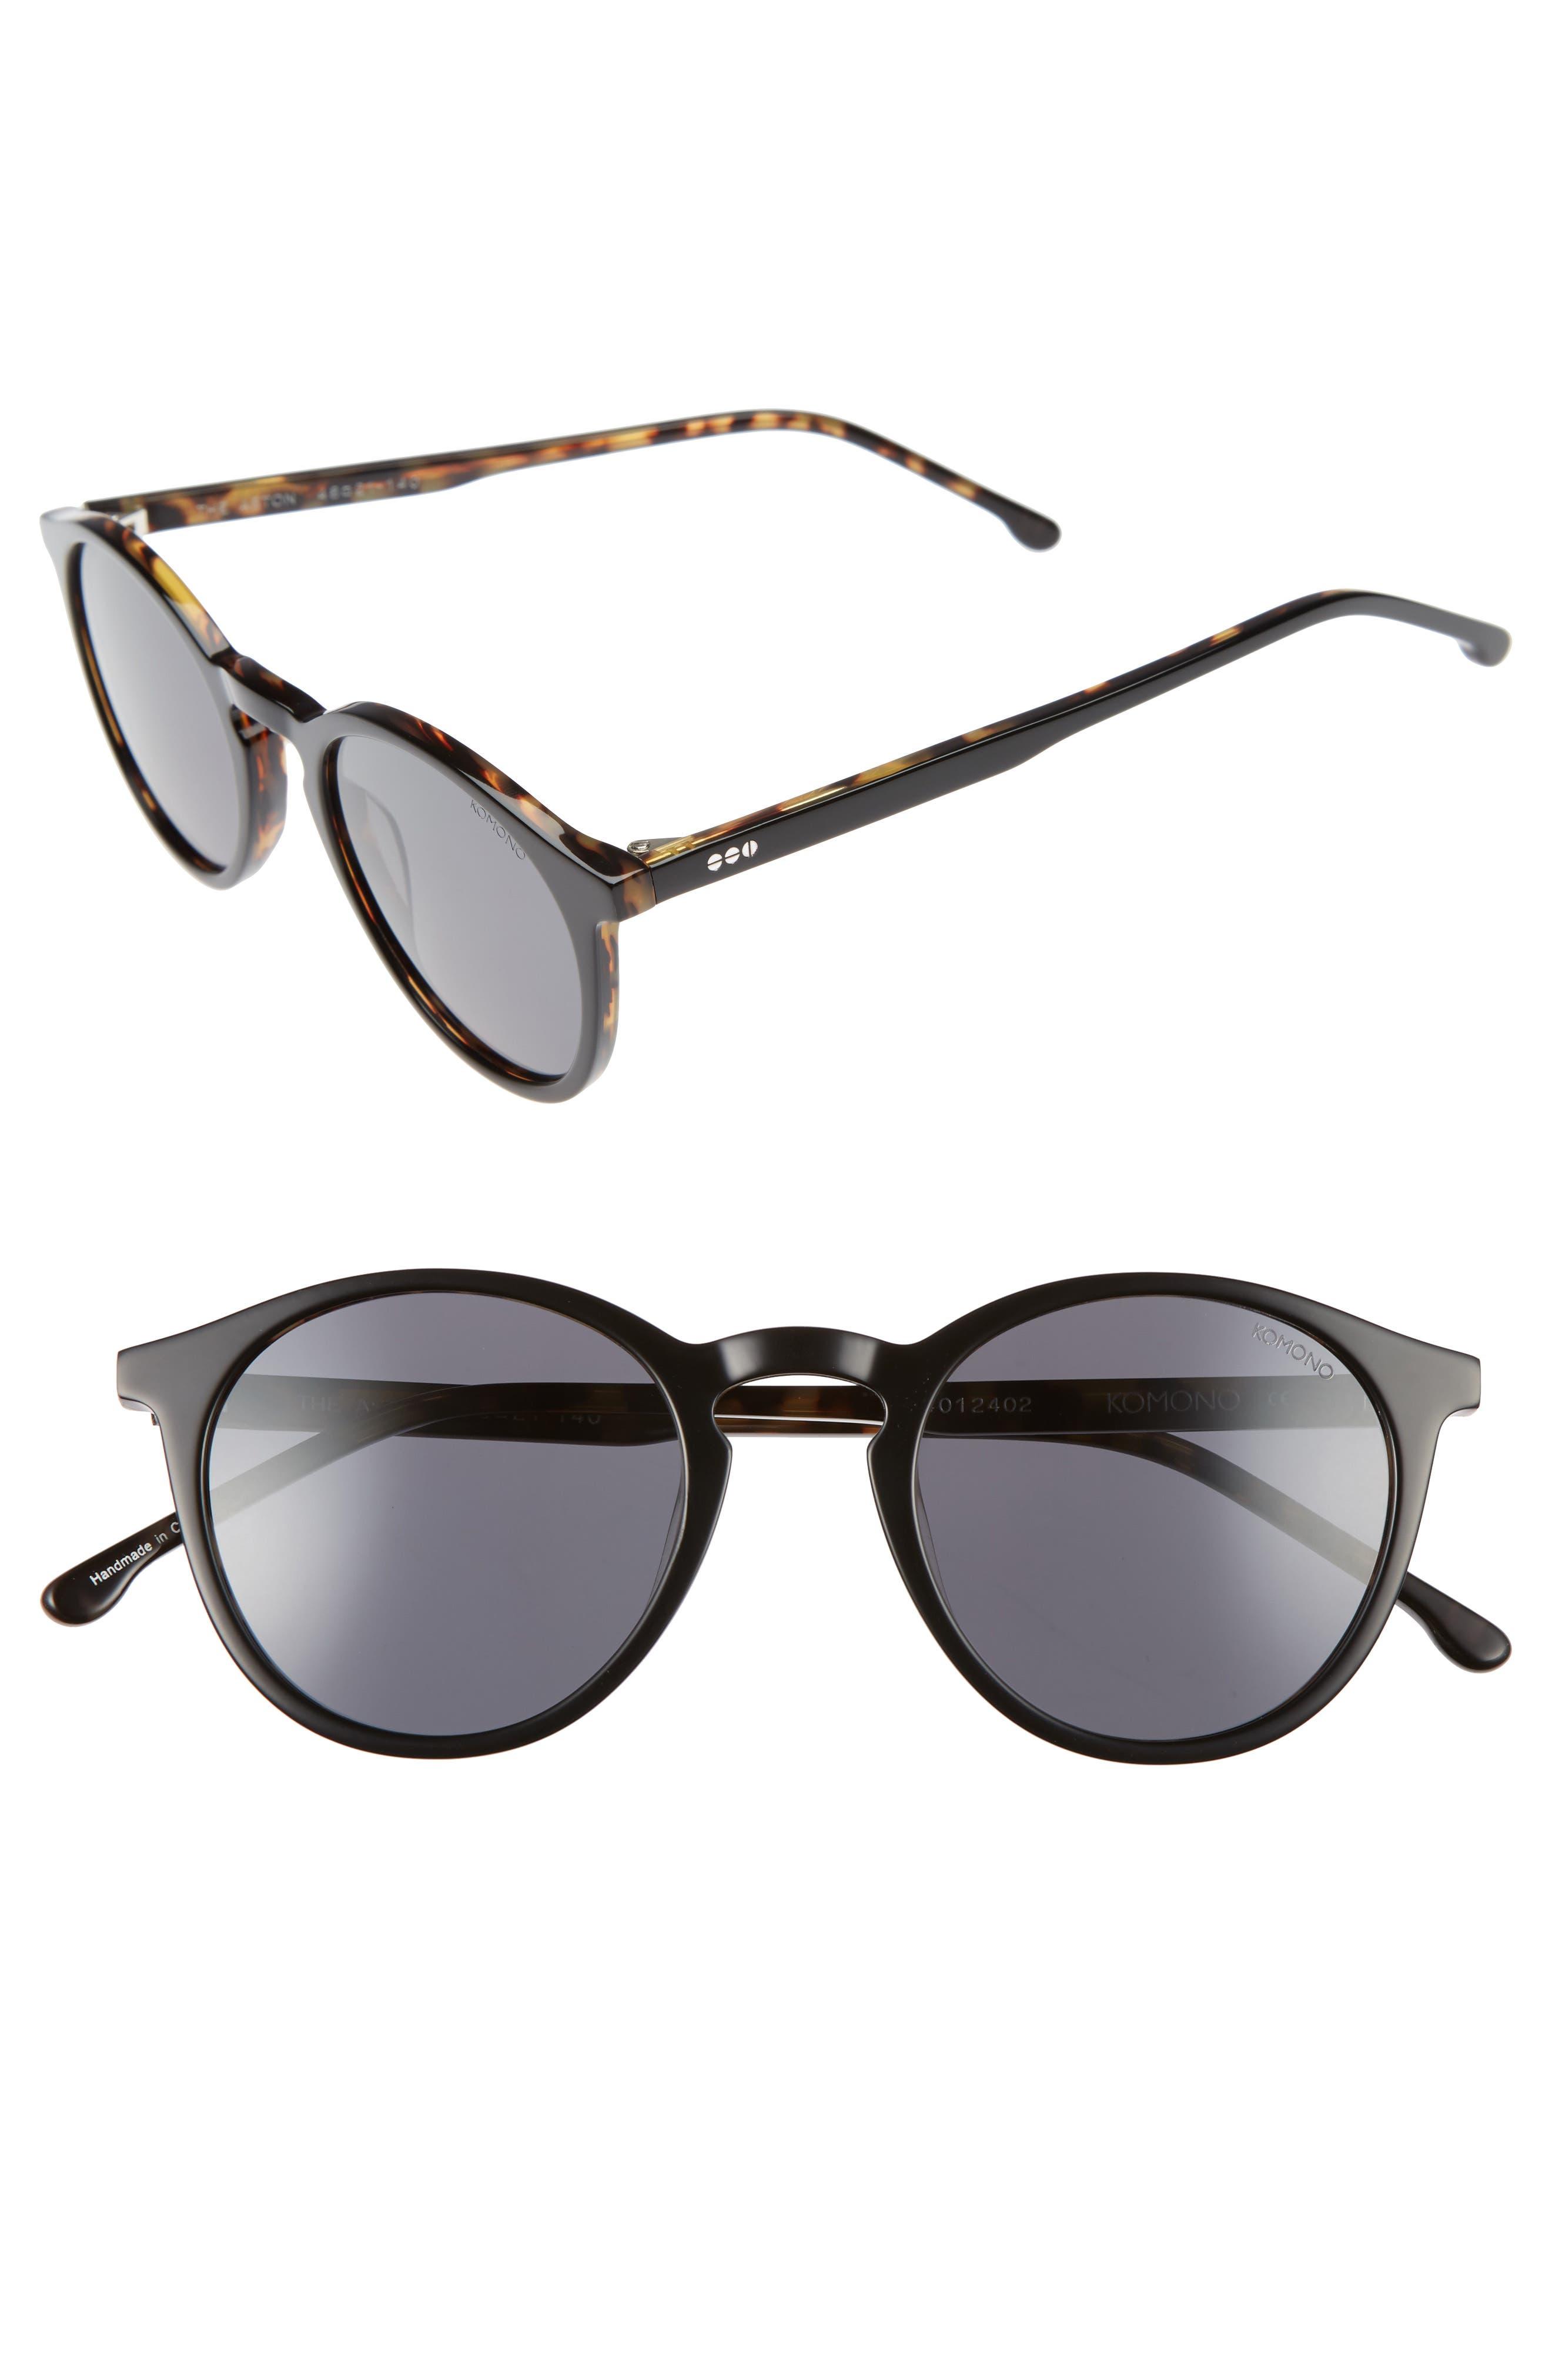 Aston 48mm Round Sunglasses,                             Alternate thumbnail 2, color,                             001